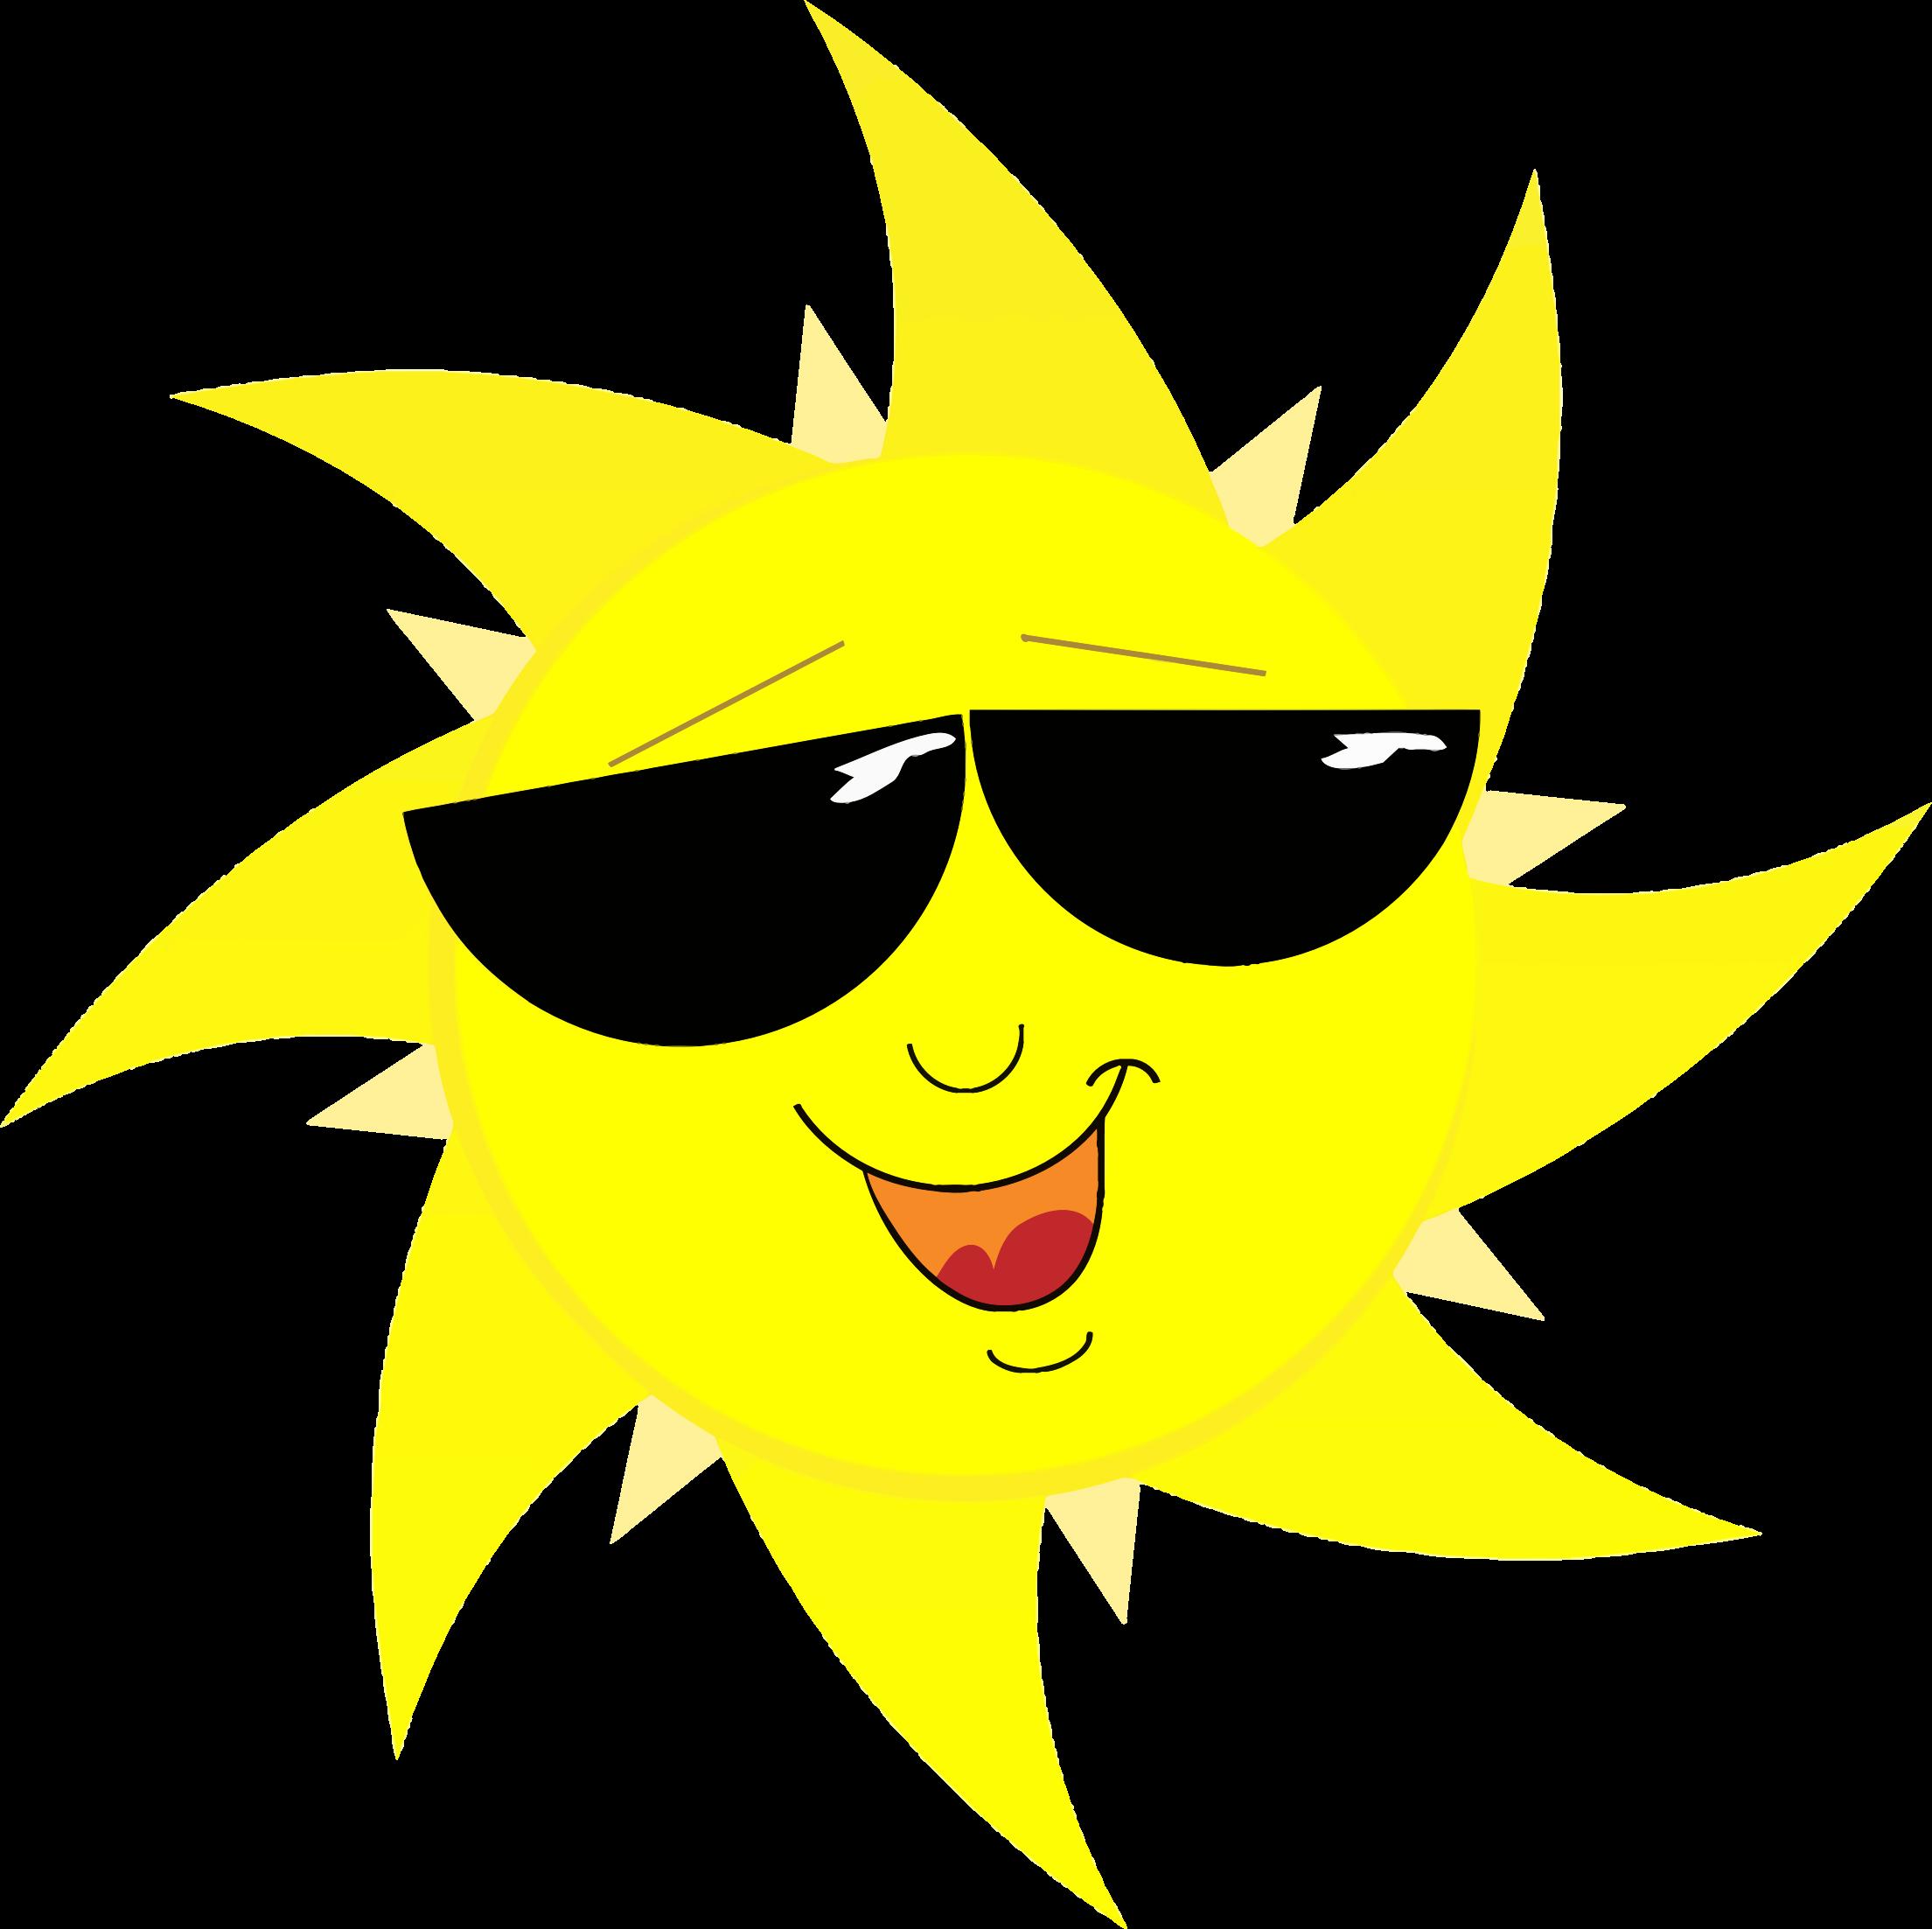 Sun with sunglasses clipart